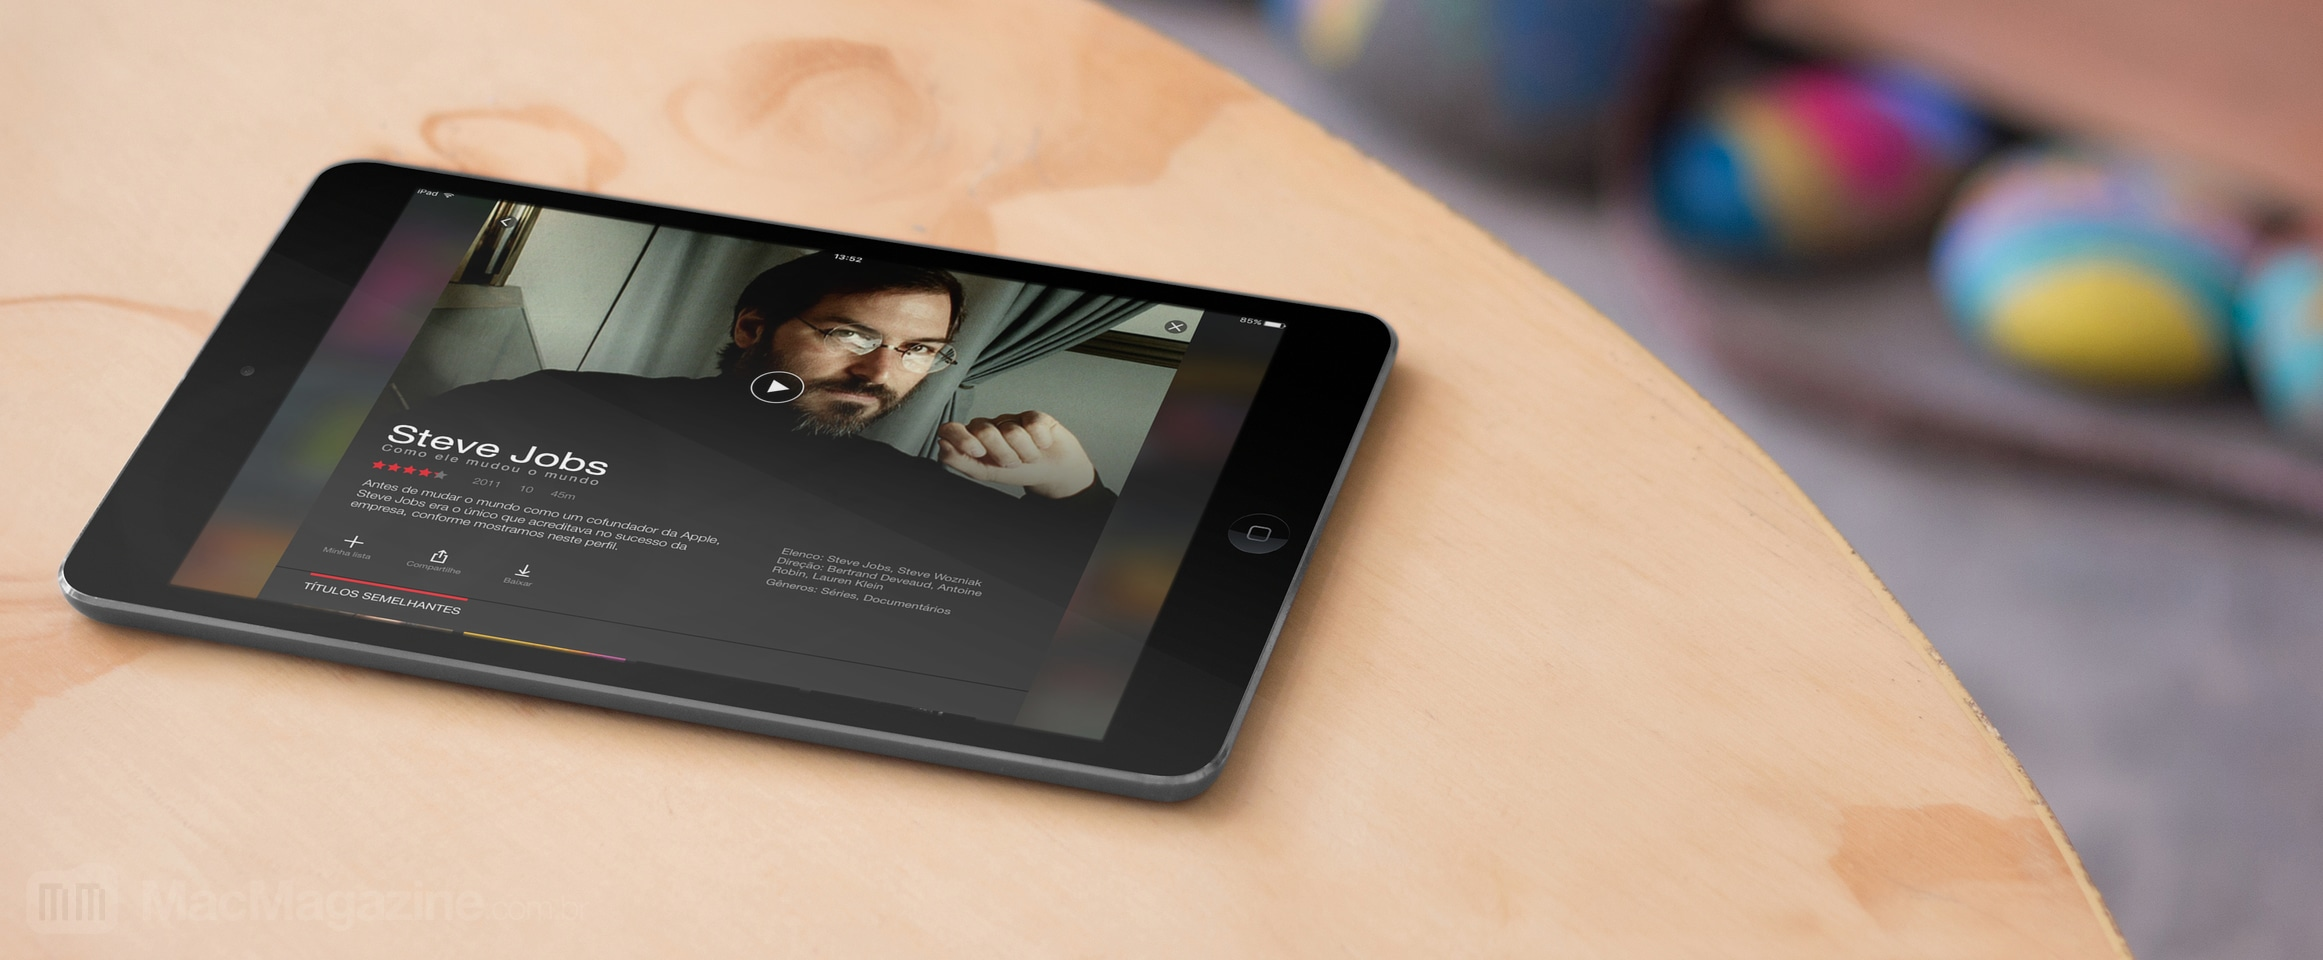 Netflix offline no iPad